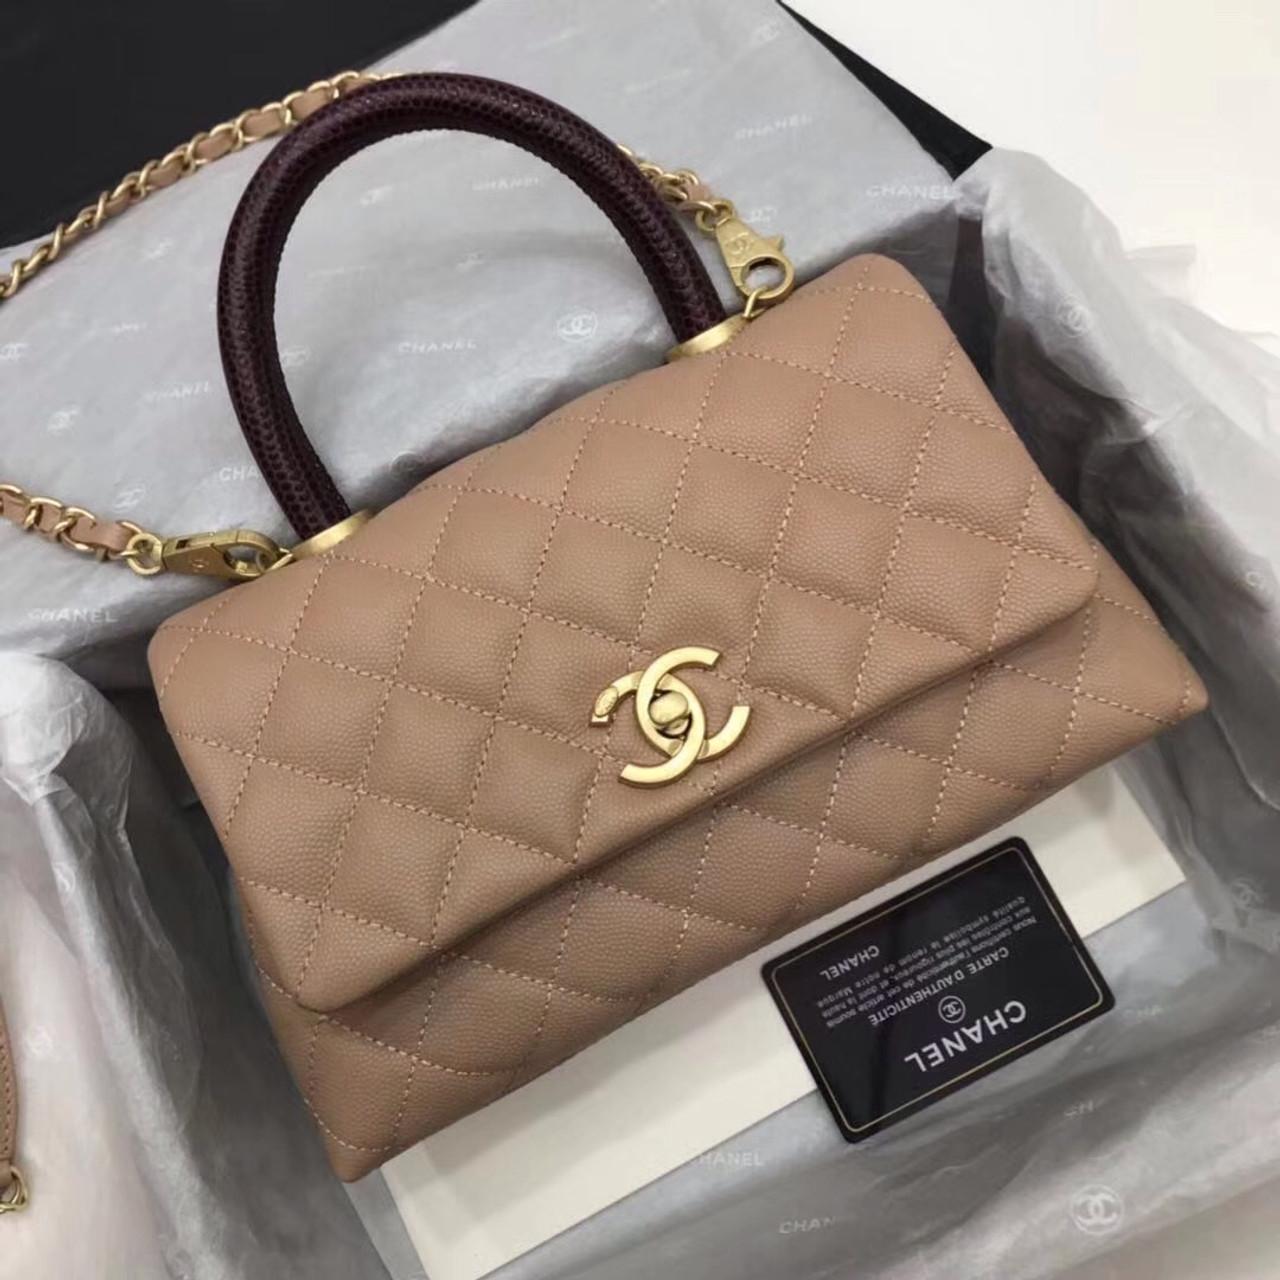 824fc195b143 Chanel Caramel Calfskin Lizard Coco Medium Handle Bag - Bella Vita Moda